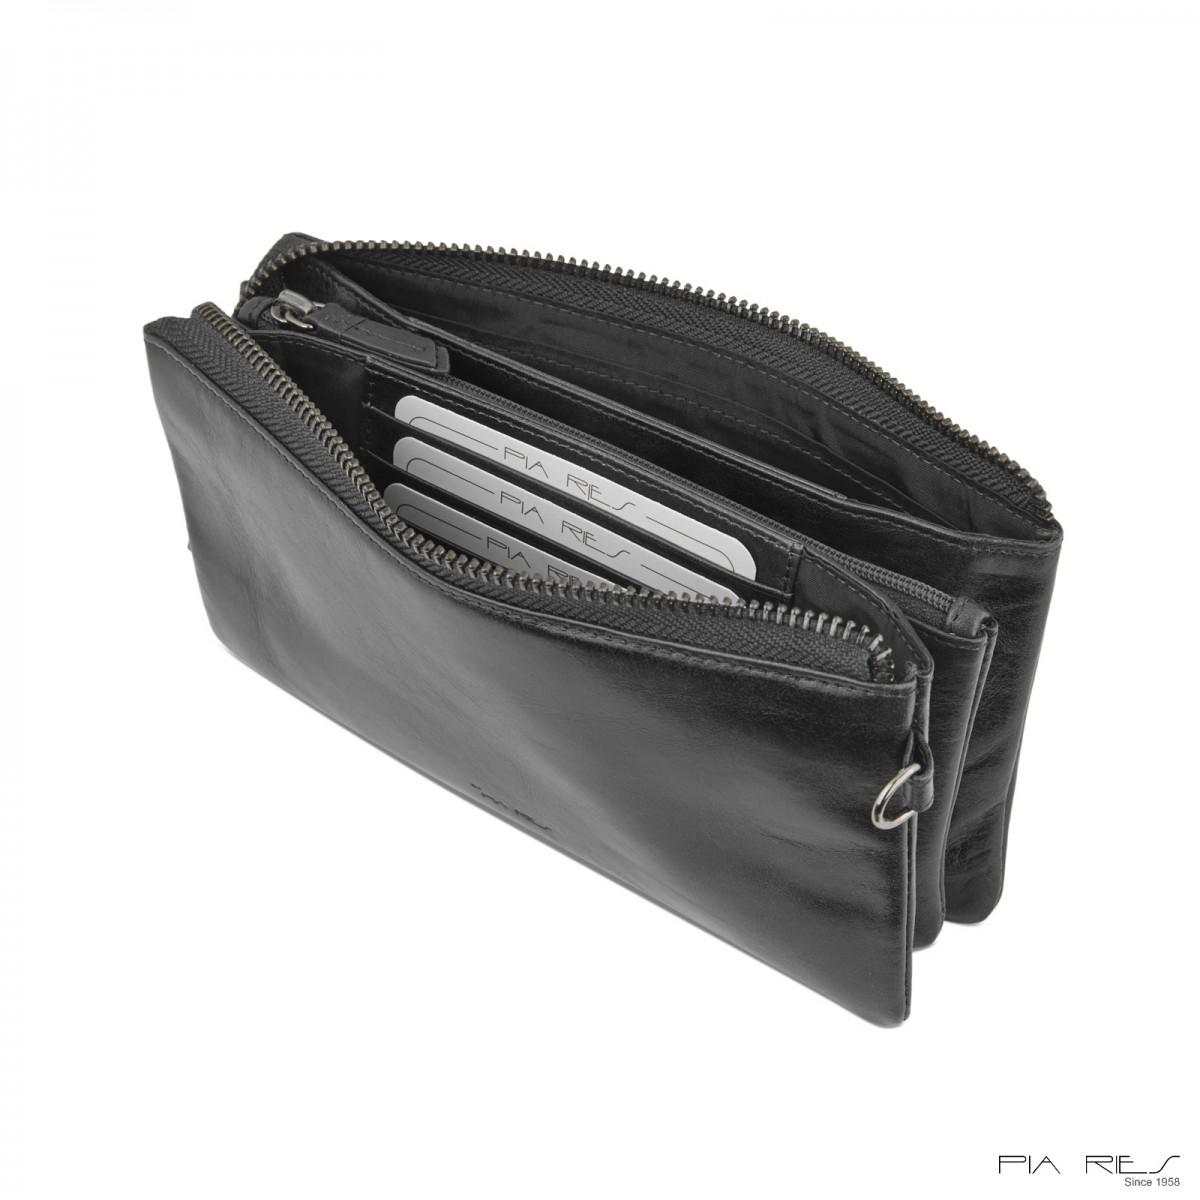 Clutch taske i Rain Crunch skind-33